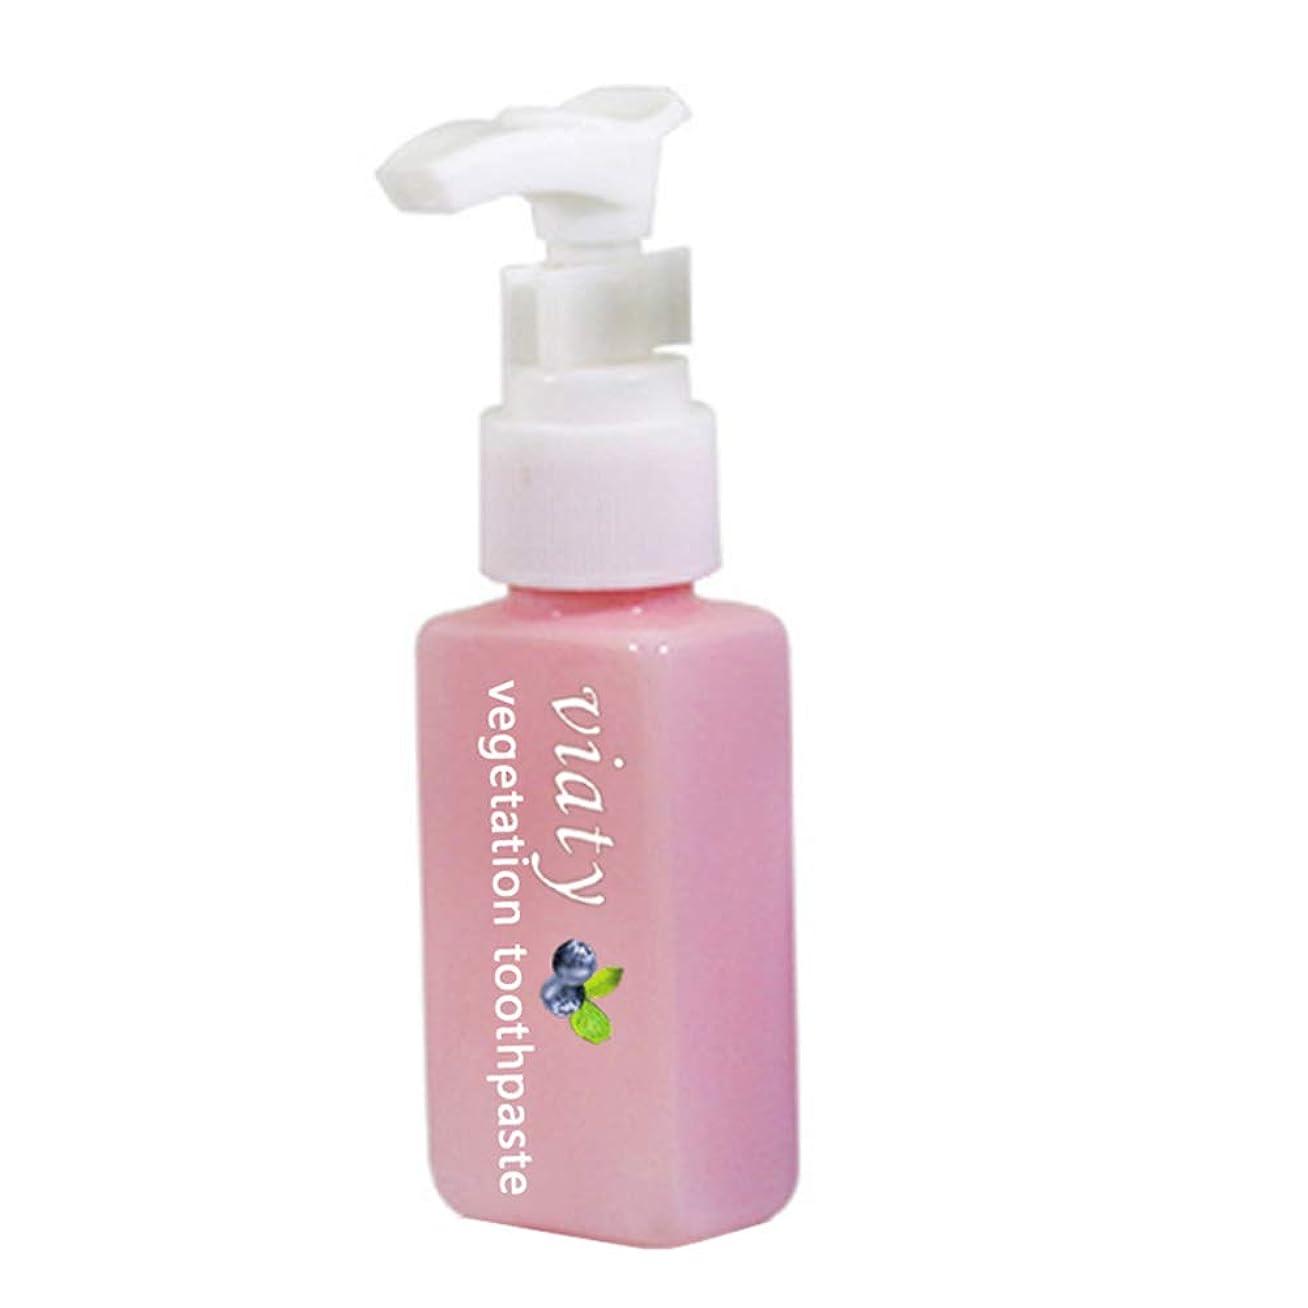 JanusSaja歯磨き粉アンチブリードガムプレスタイプ新鮮な歯磨き粉を白くする汚れ除去剤